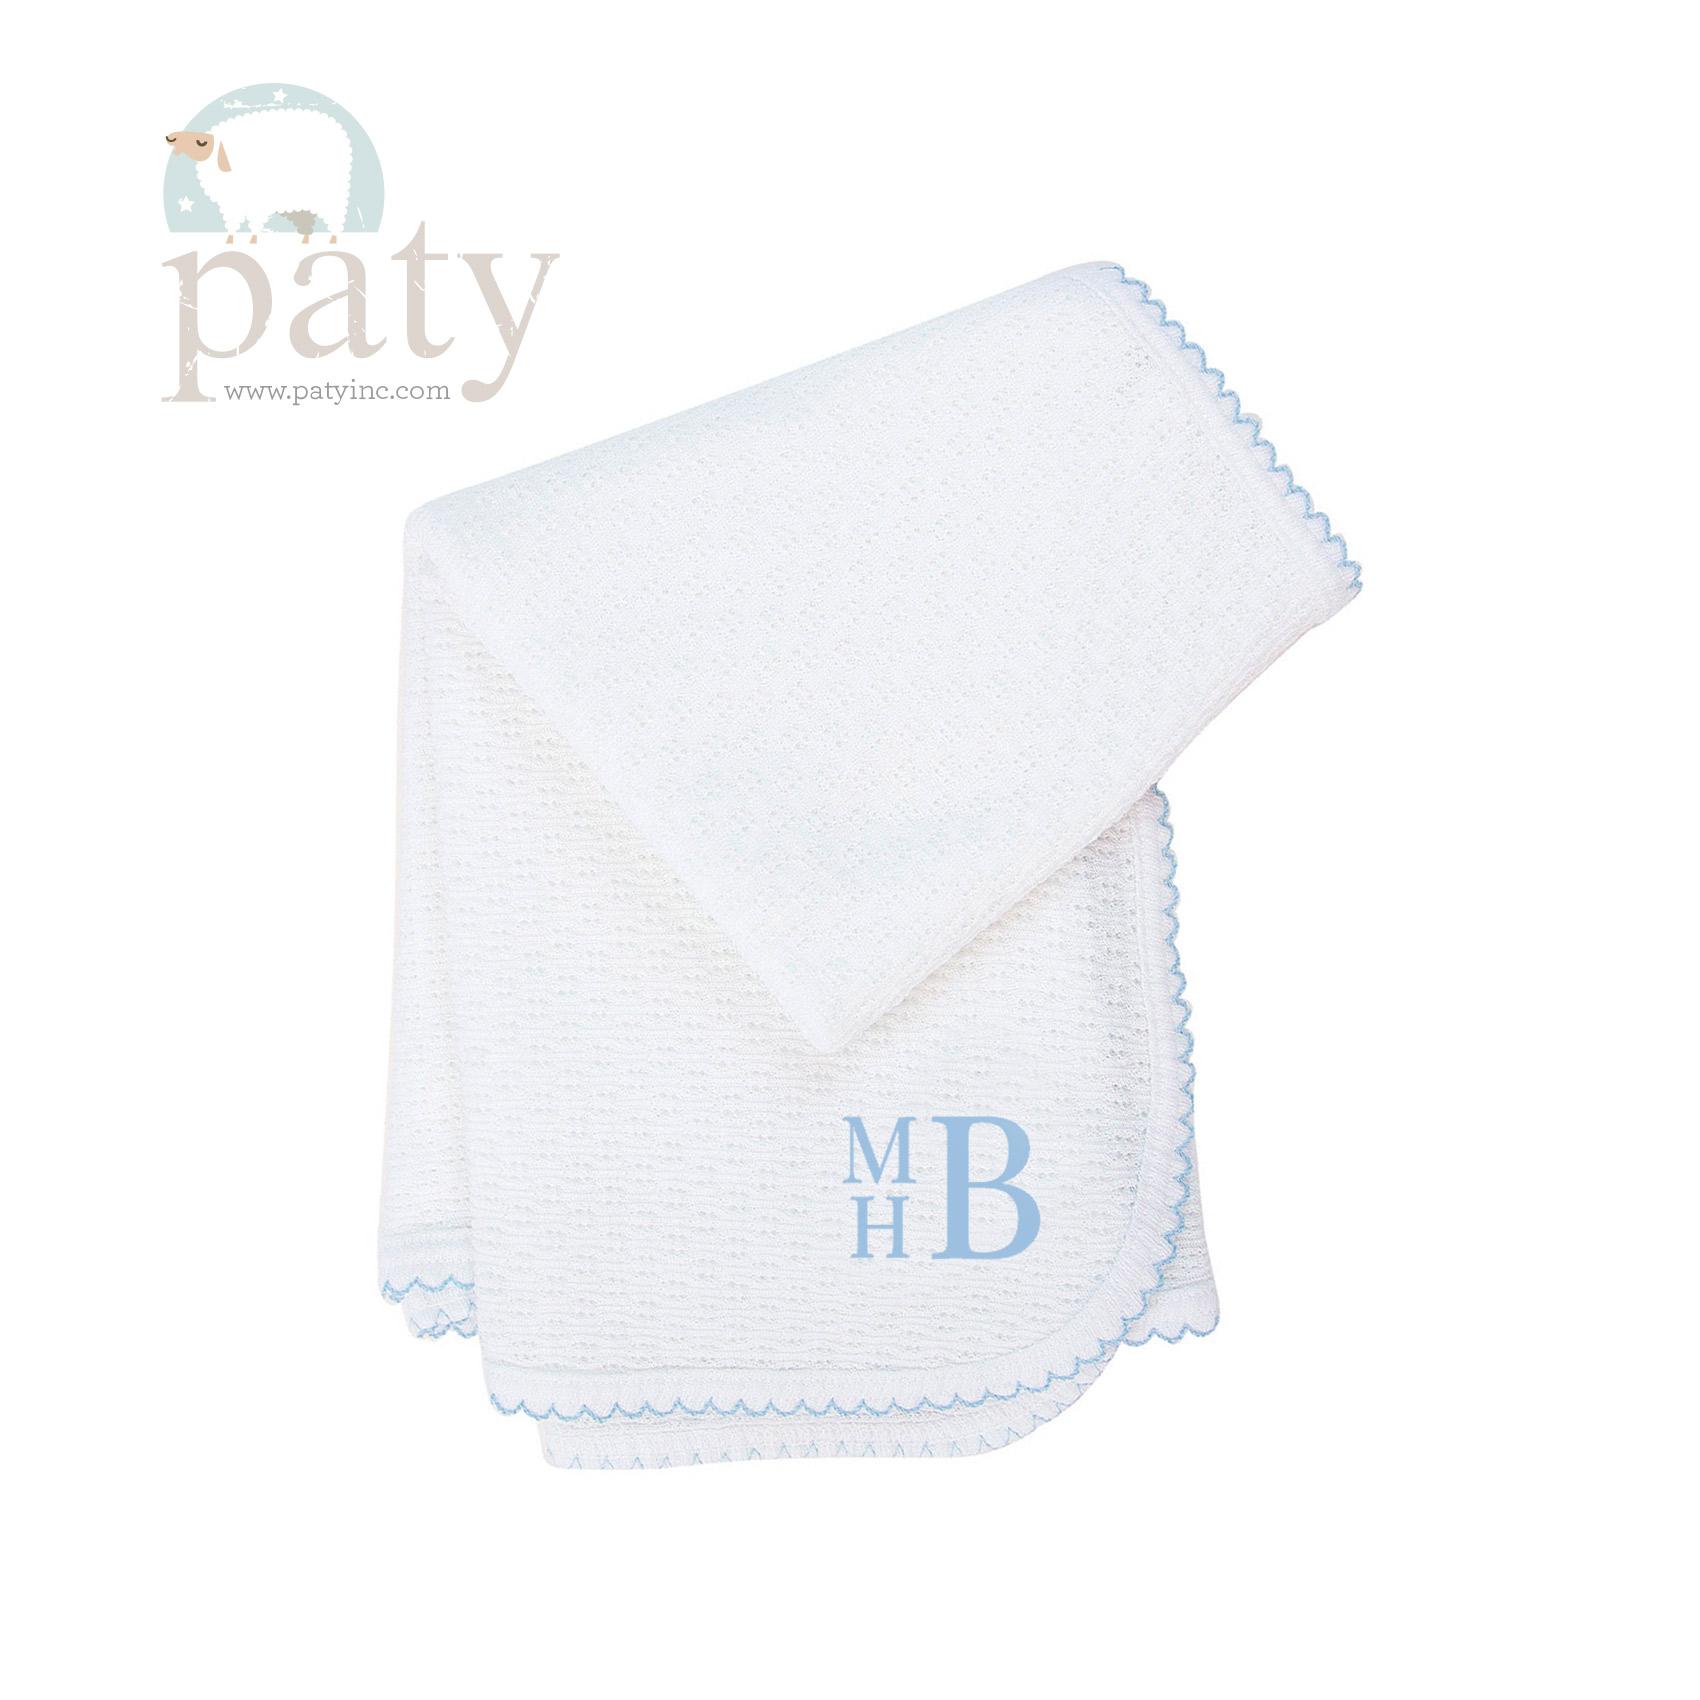 Paty Original Blue Trim Monogrammed Blanket